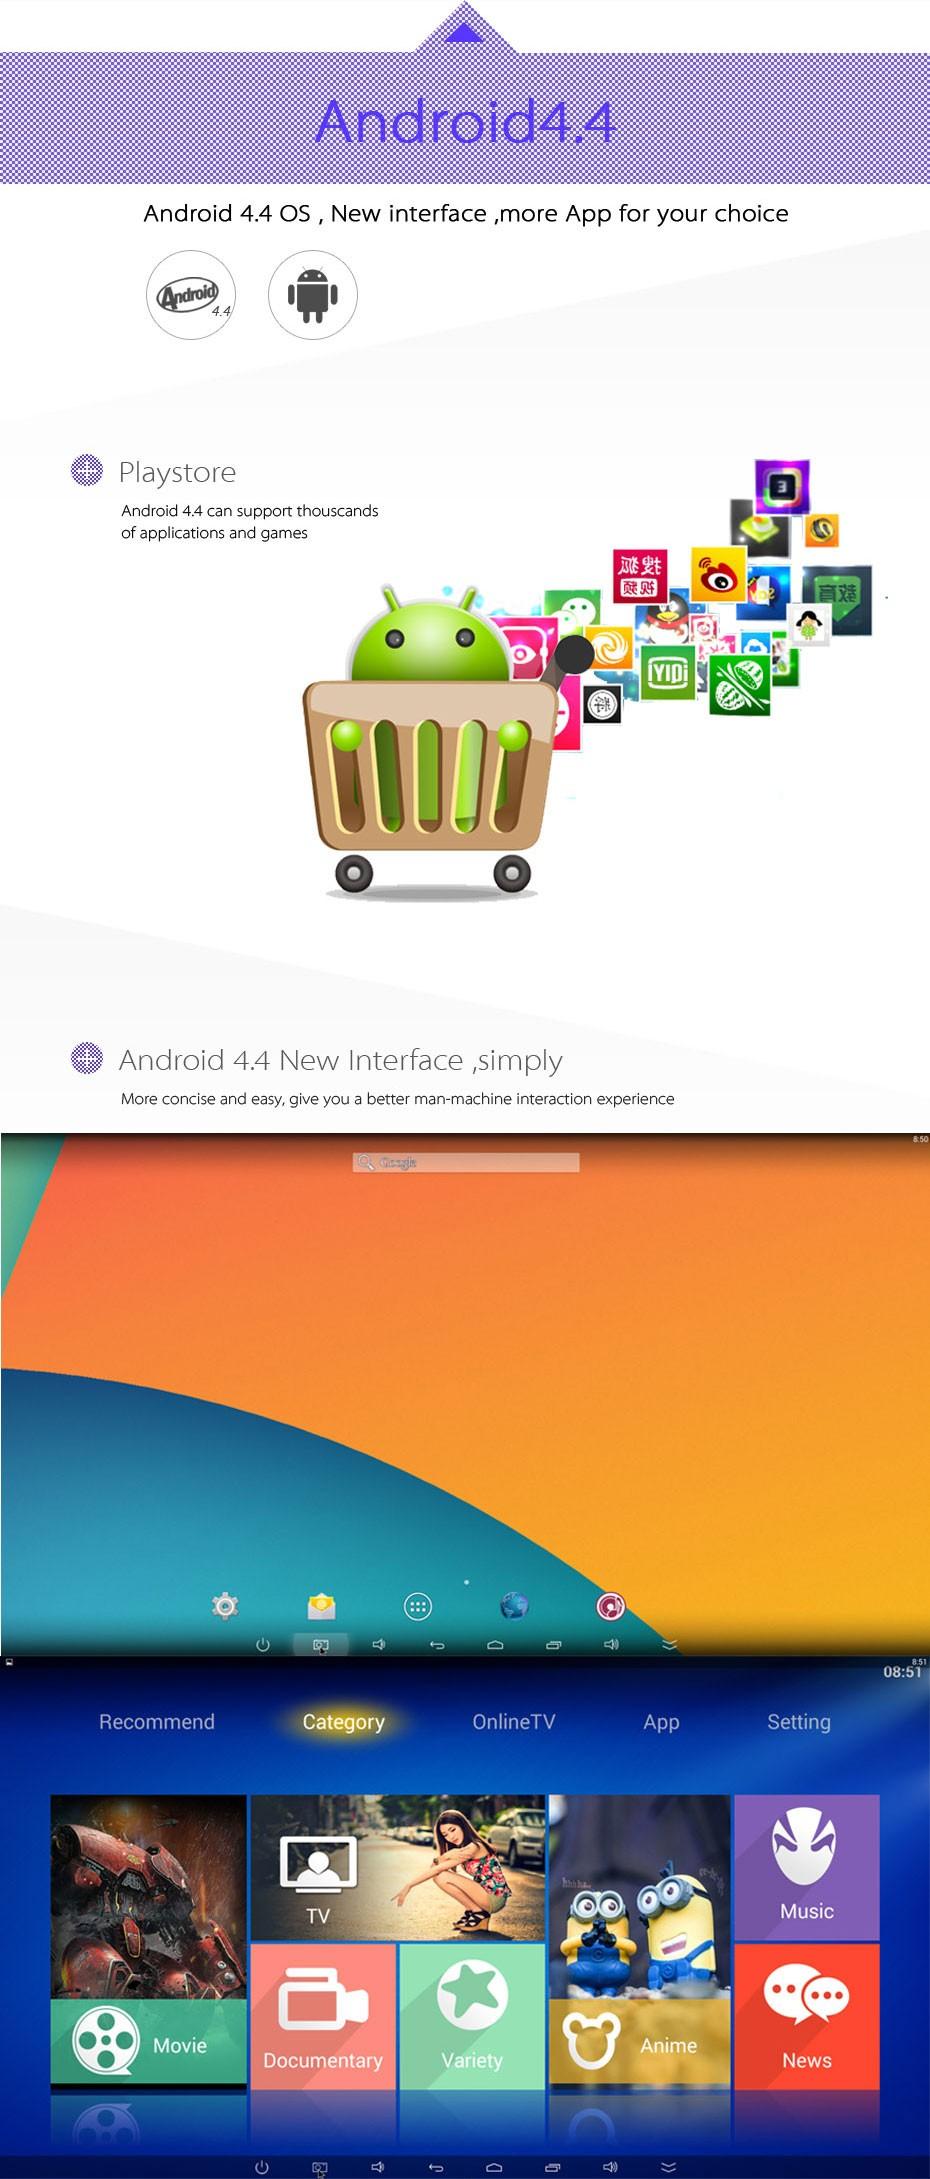 Cloudnetgo Android Tv Box With Sim Card Modi Android Tv Box Desi Tv Box -  Buy Android Tv Box With Sim Card,Modi Android Tv Box,Desi Tv Box Product on